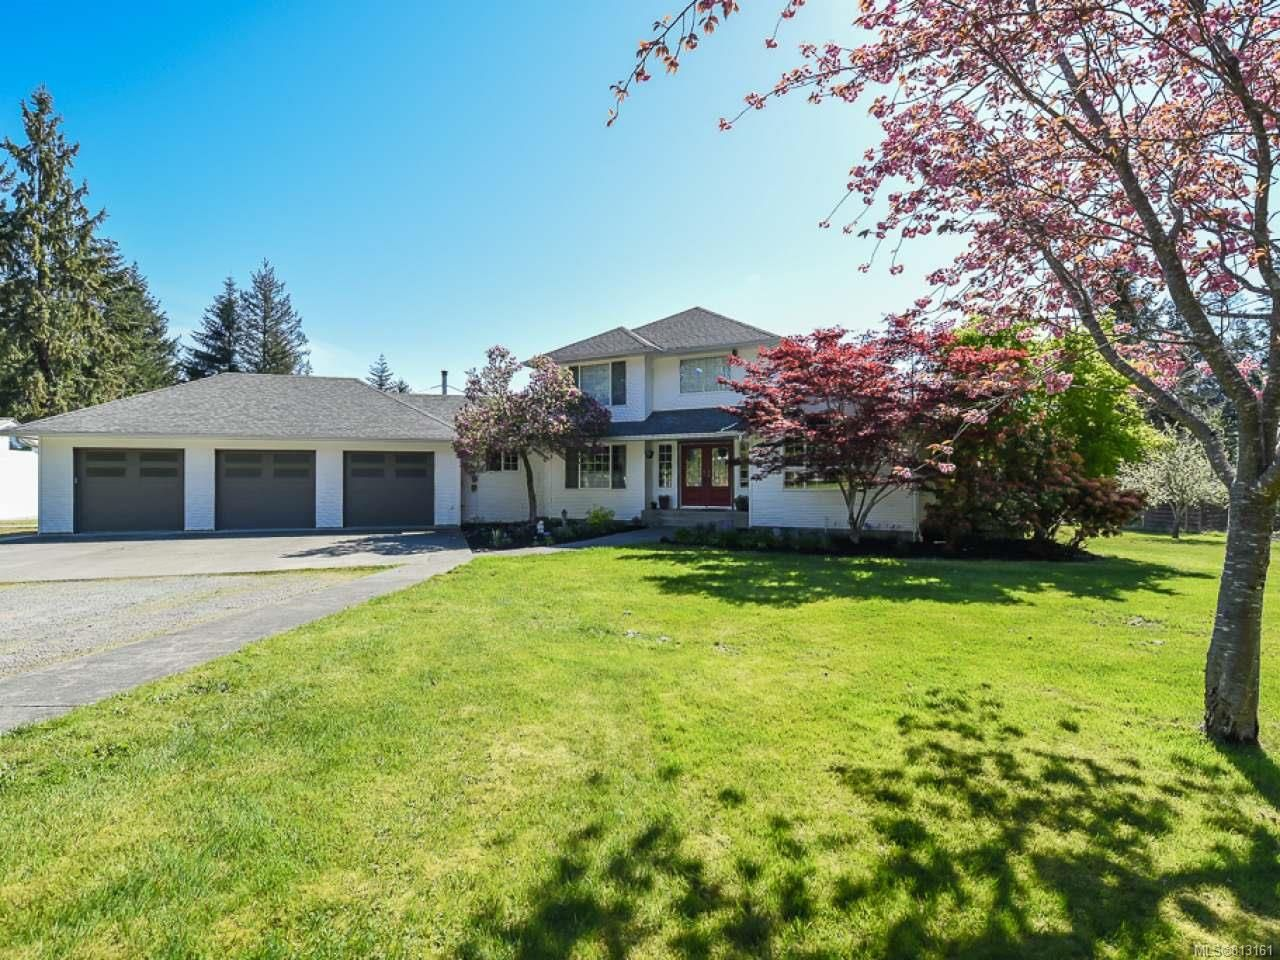 Main Photo: 2096 May Rd in COMOX: CV Comox Peninsula House for sale (Comox Valley)  : MLS®# 813161